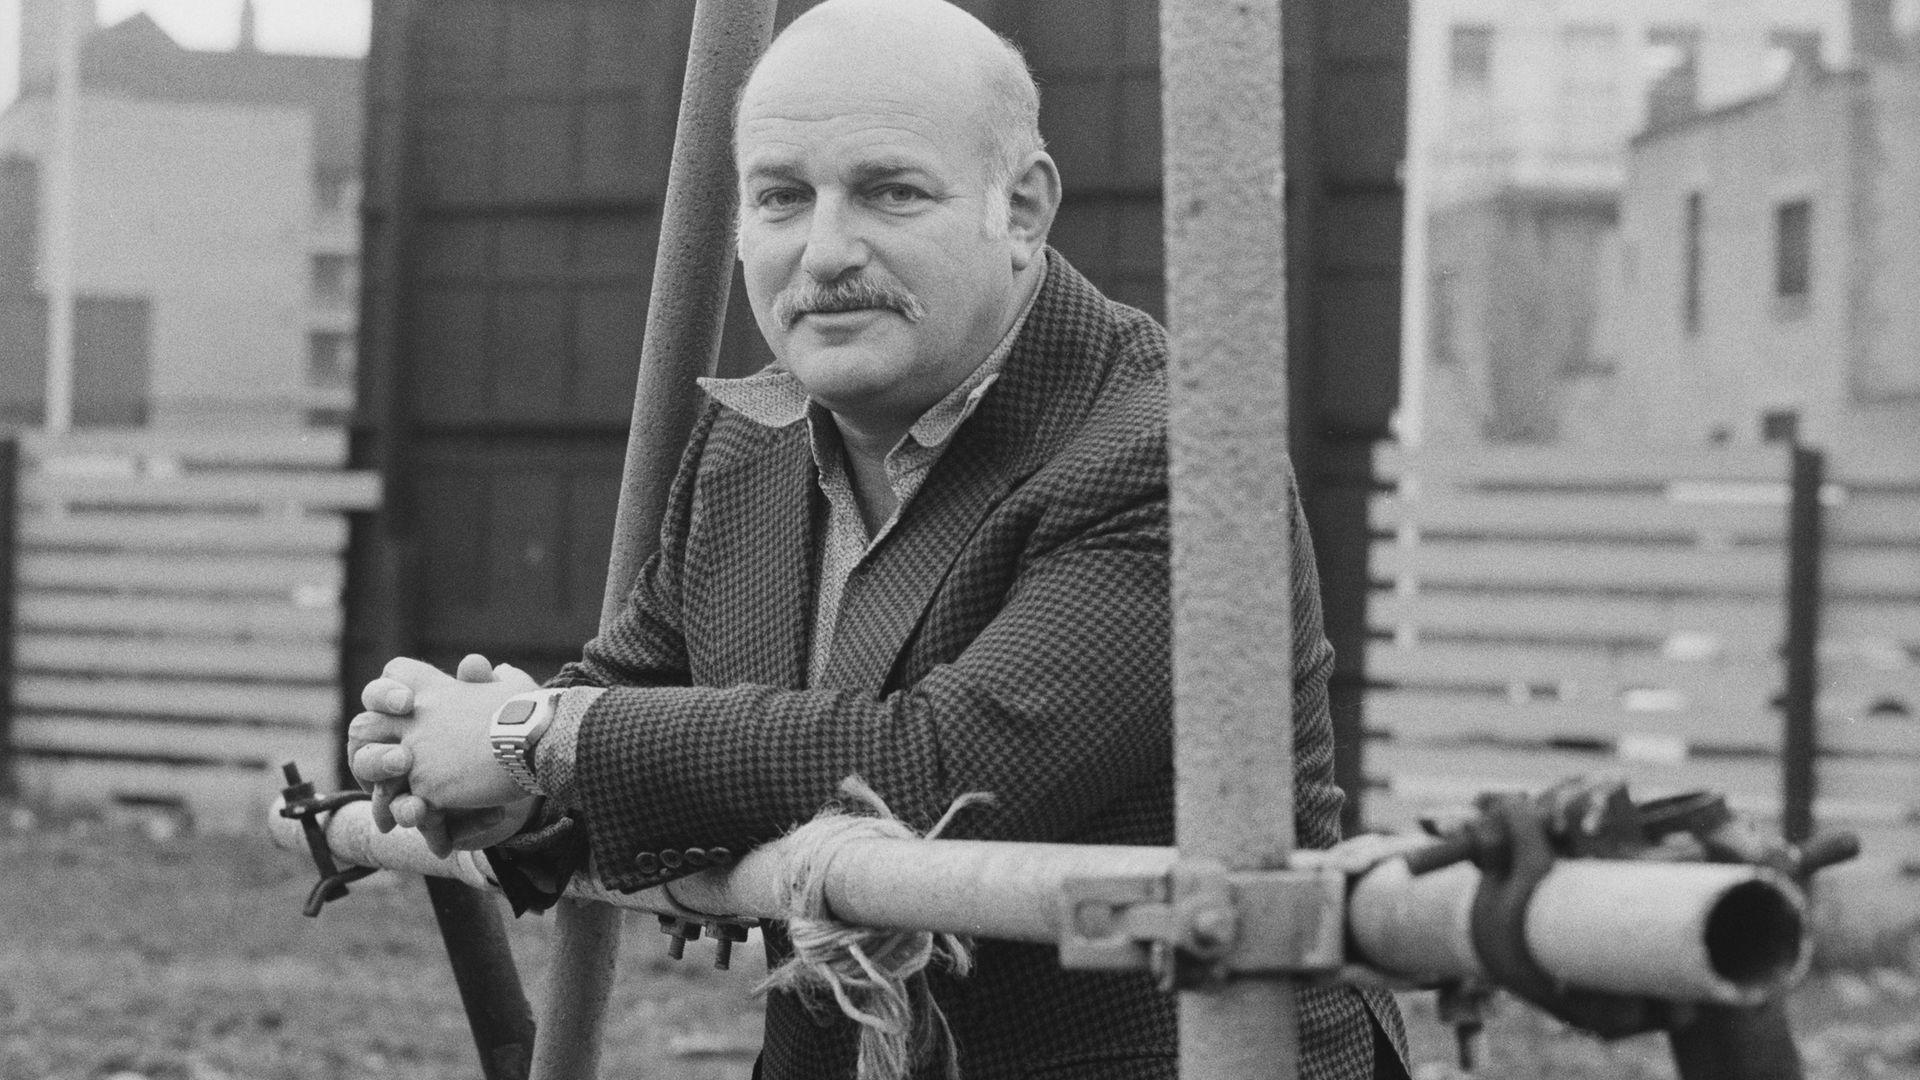 John Schlesinger in 1975 - Credit: Getty Images